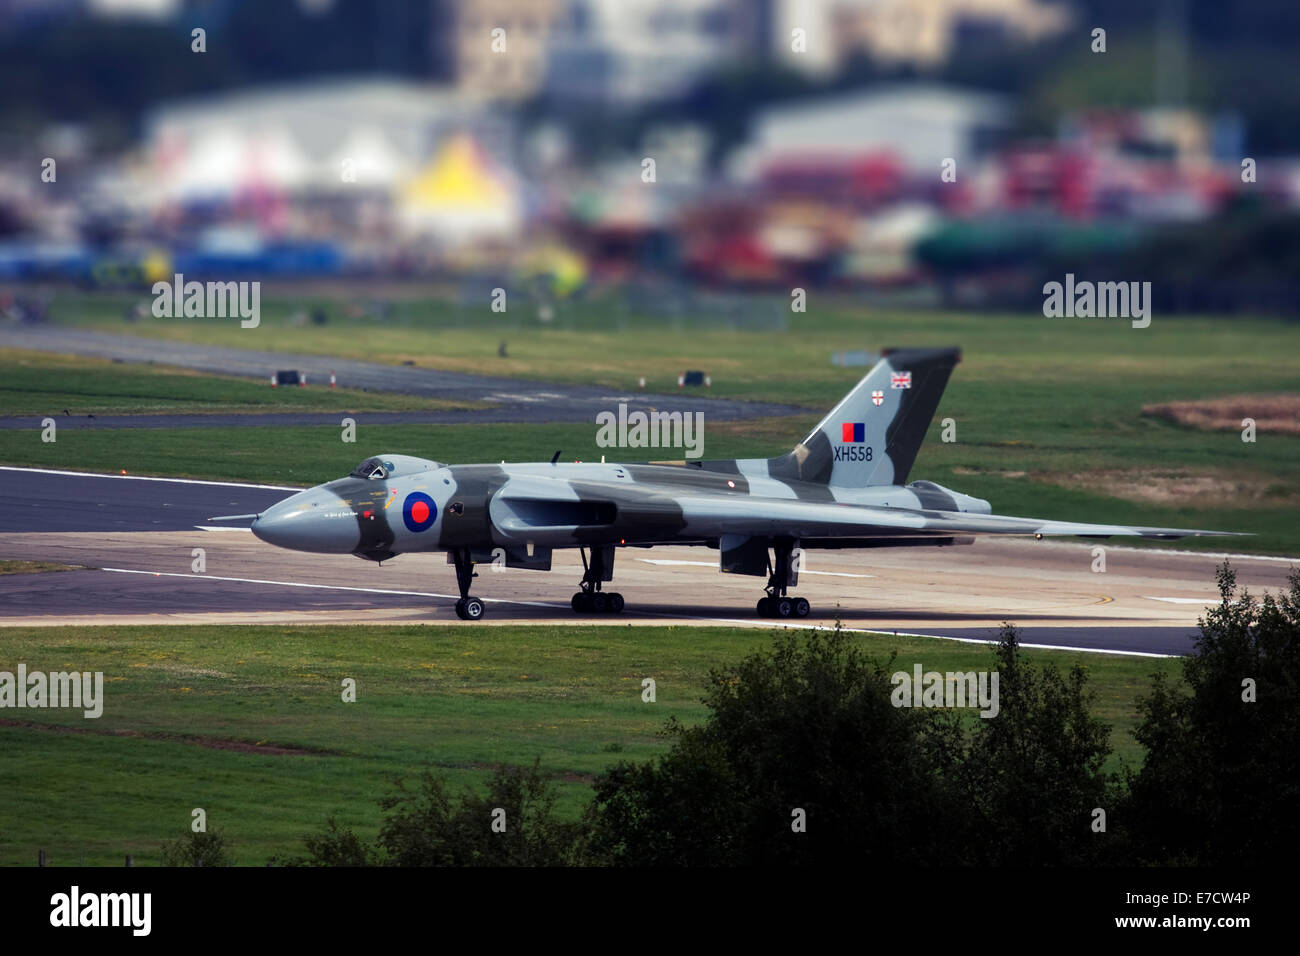 Avro 698 Vulcan B2  strategic bomber at Farnborough International Airshow 2014 - Stock Image